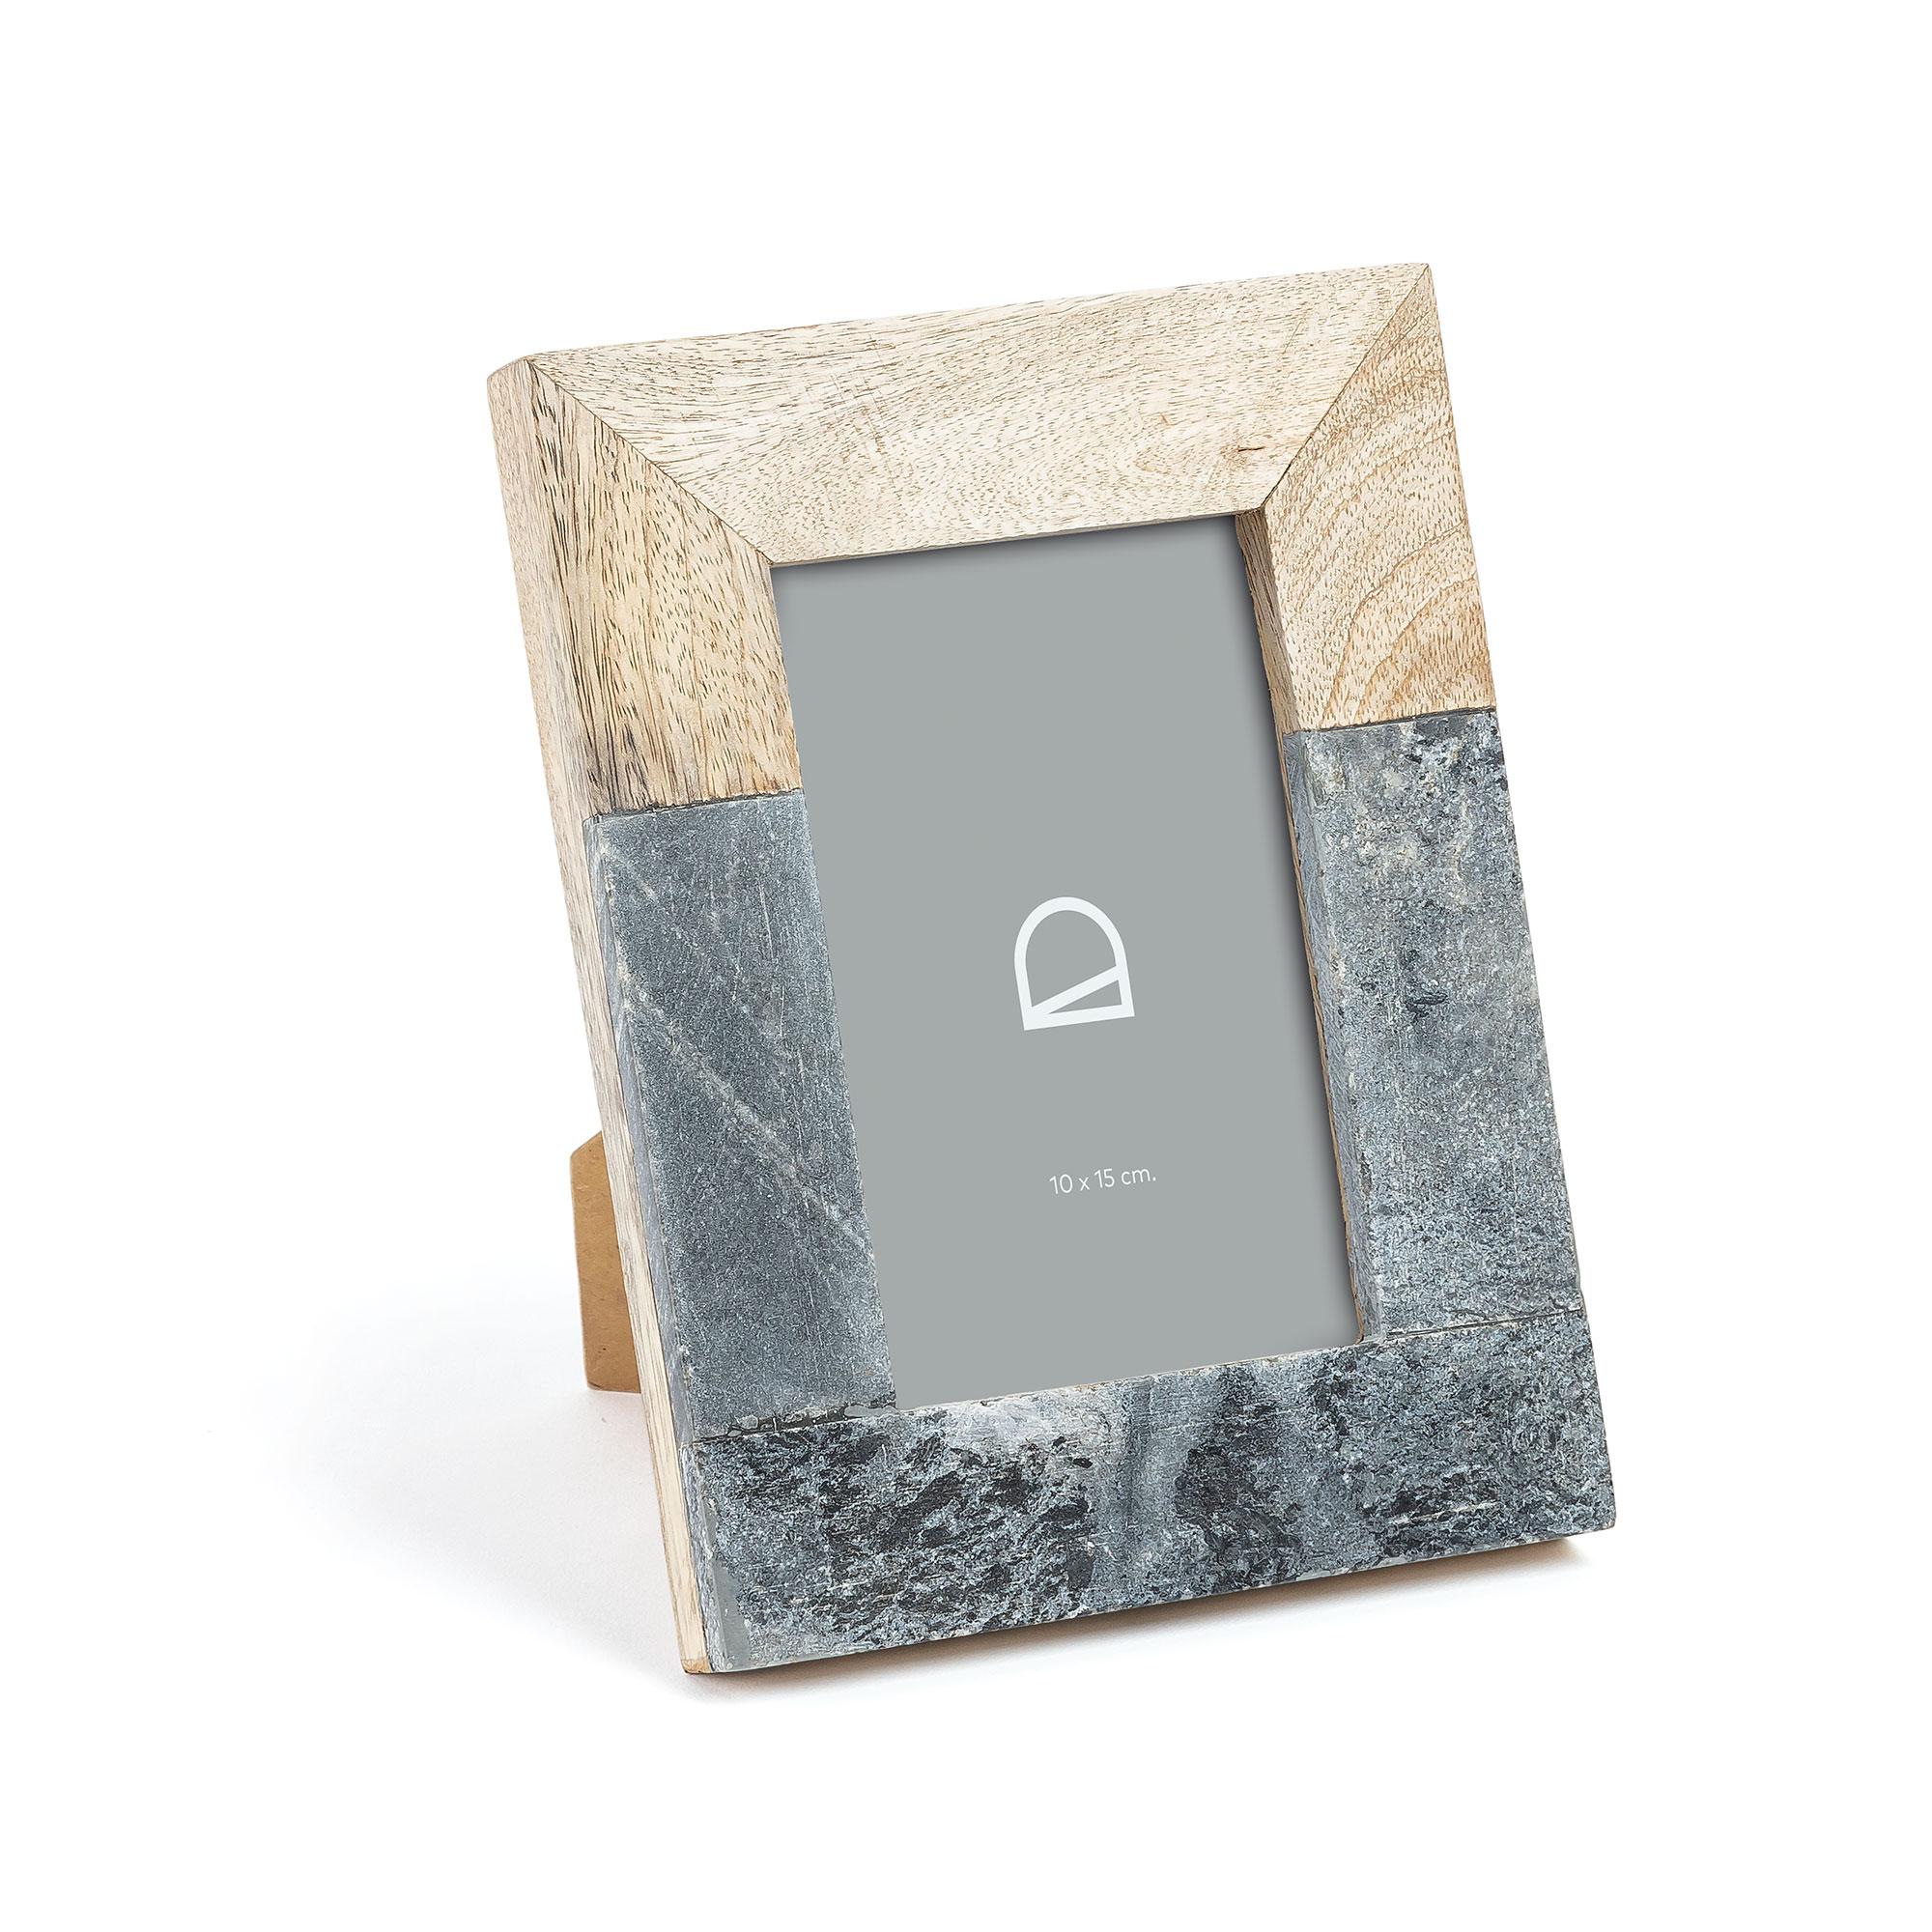 Kave Home 'Estel' 10 x 15cm, kleur Grijs korting